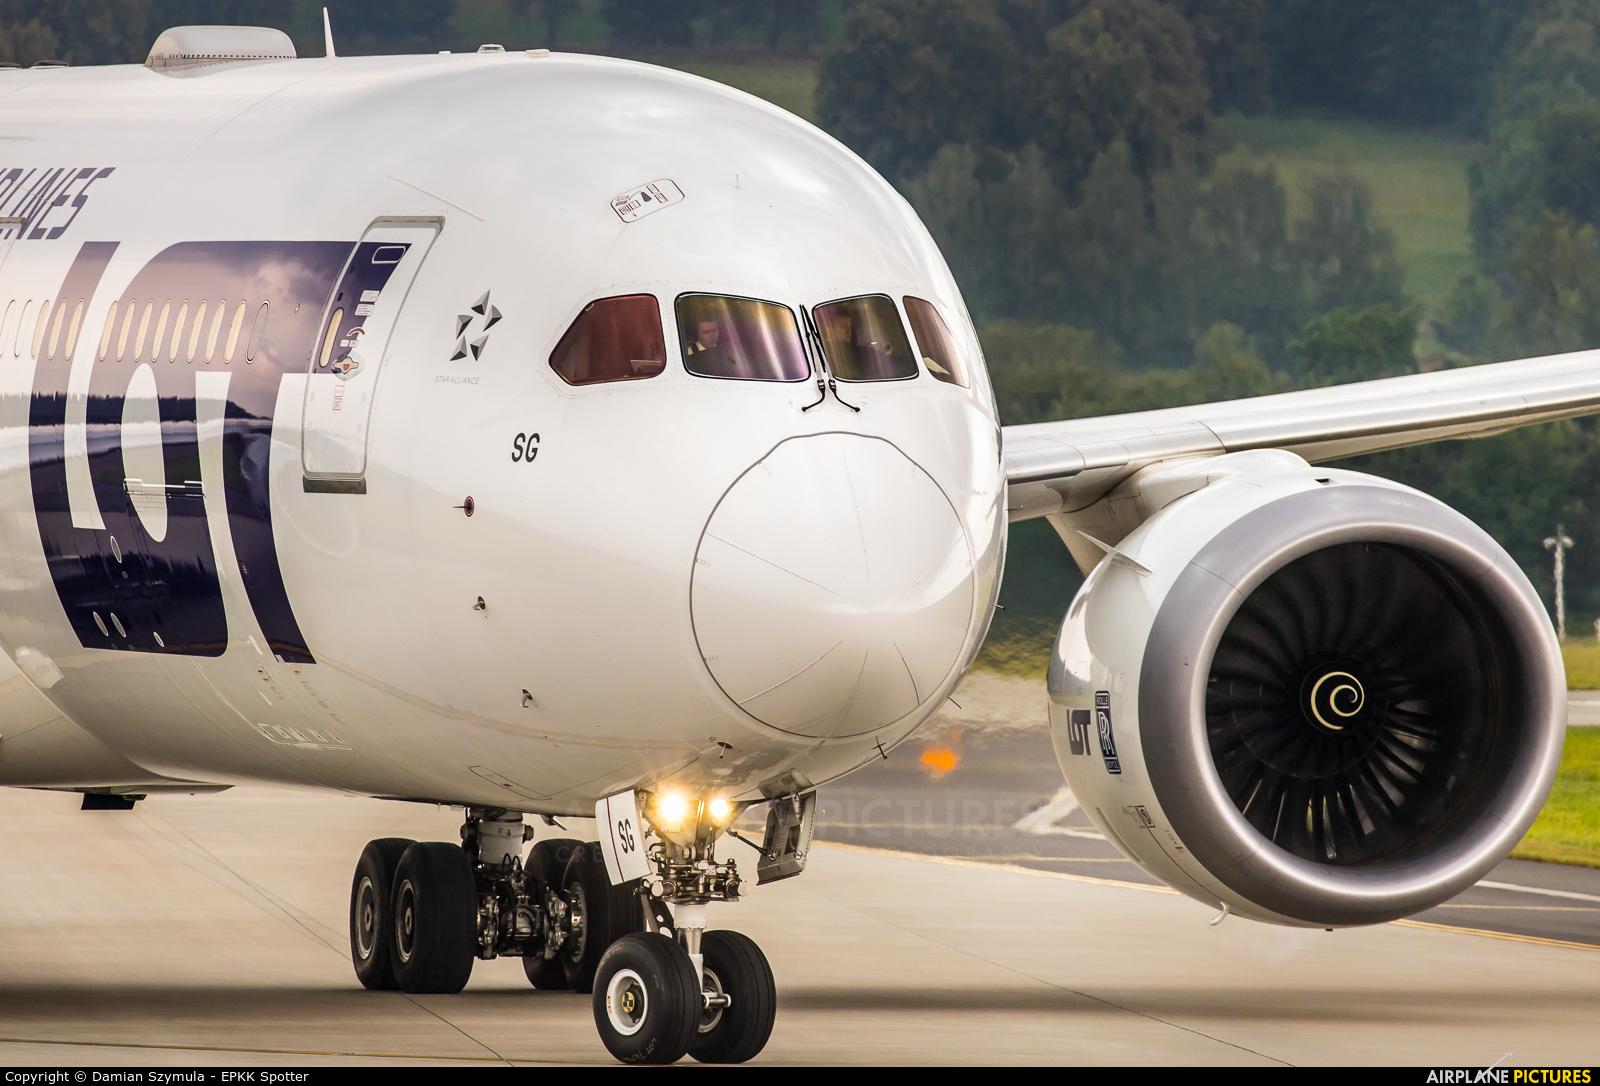 LOT - Polish Airlines SP-LSG aircraft at Kraków - John Paul II Intl